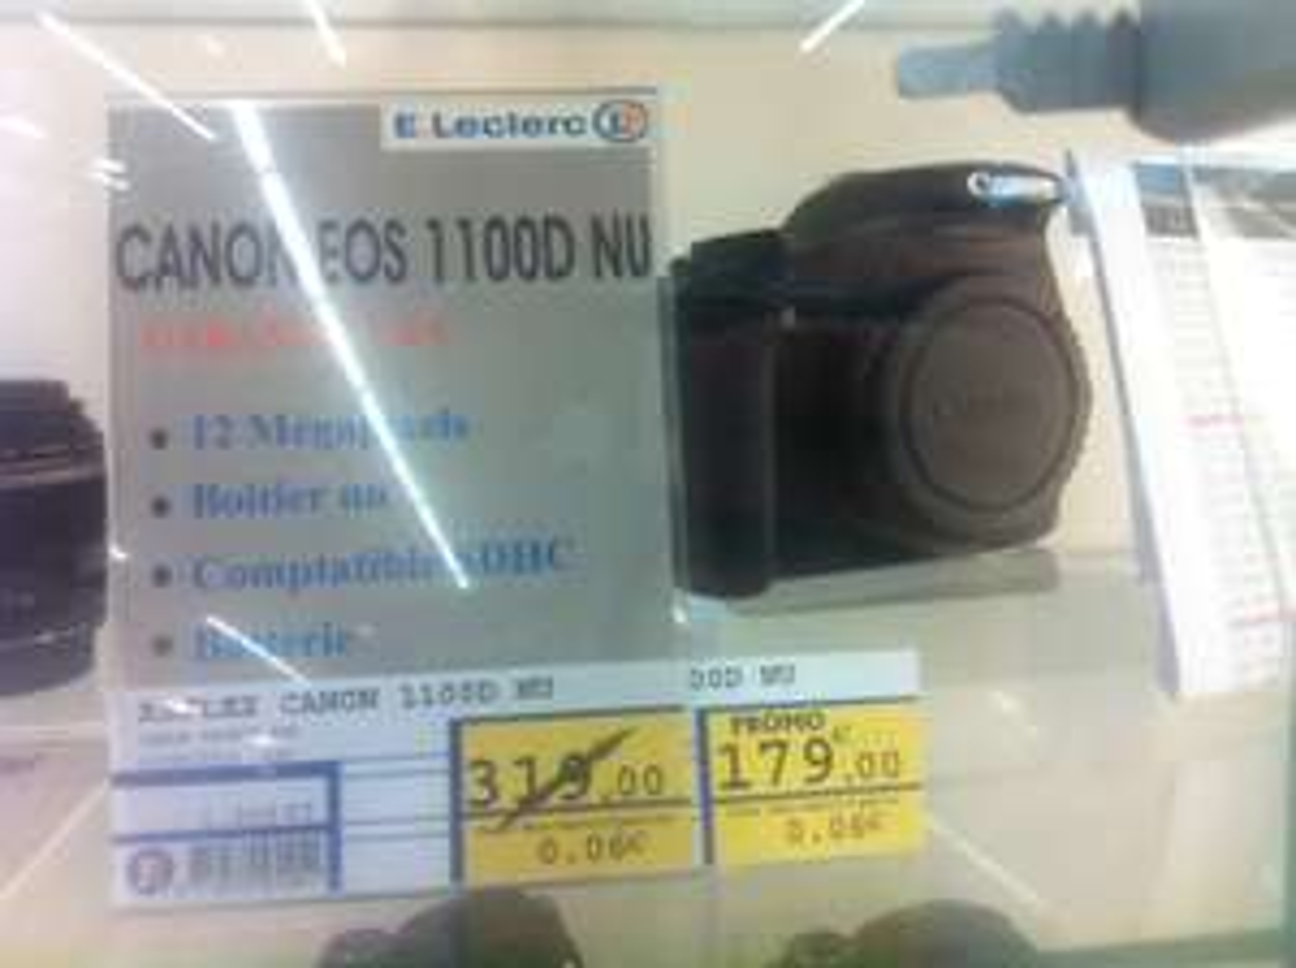 Appareil photo Canon 1100D Nu